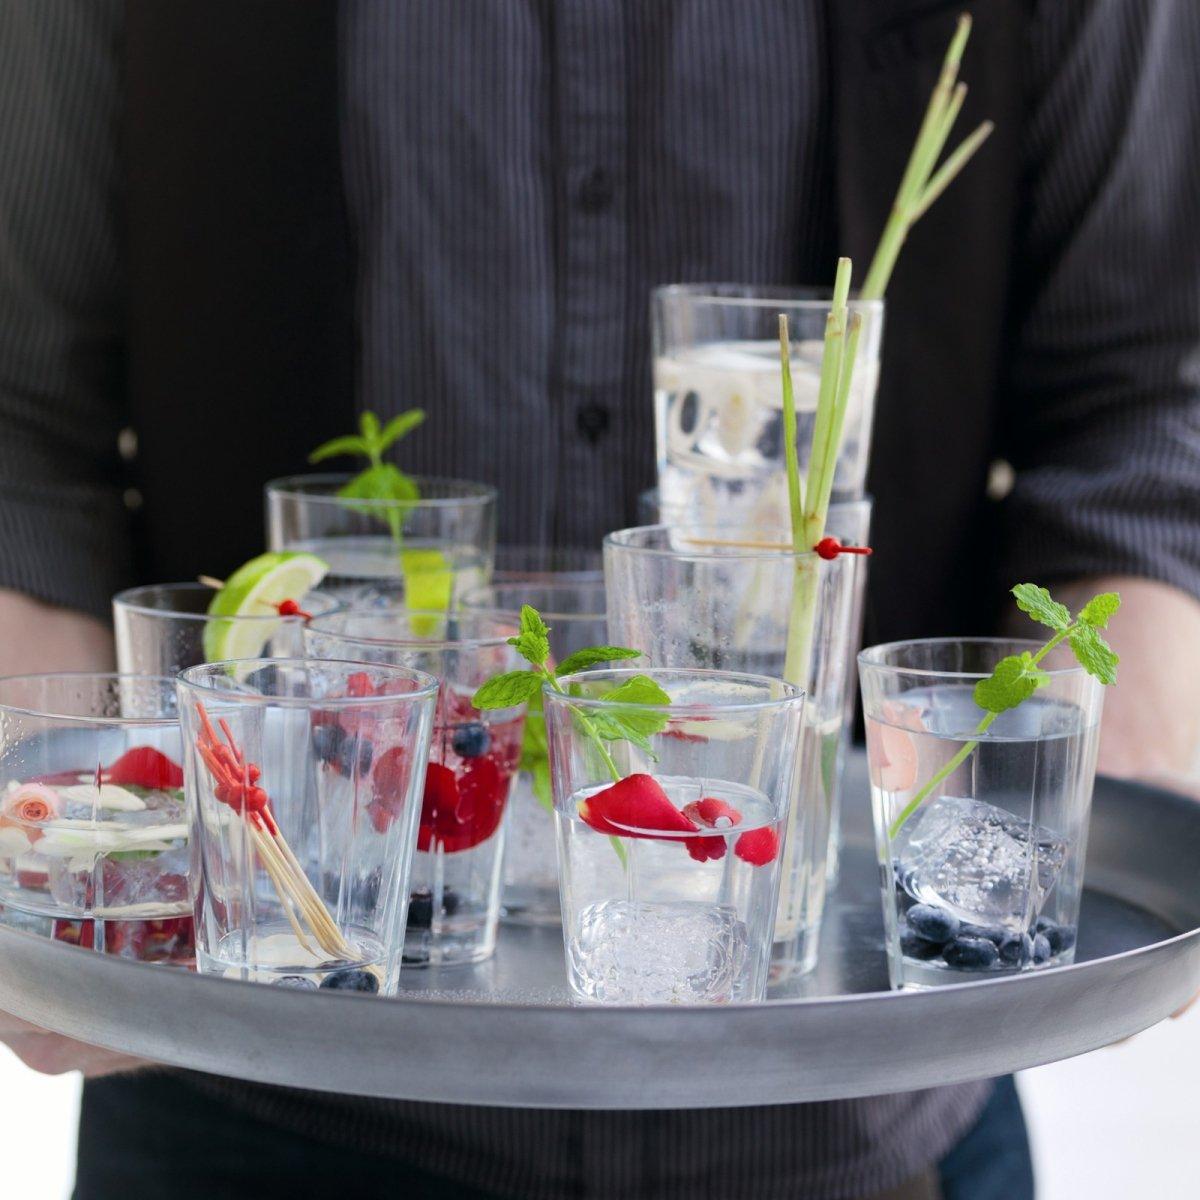 rosendahl grand cru szklanki do wody 220 ml 6 szt szklanki do wody szklanki i dzbanki. Black Bedroom Furniture Sets. Home Design Ideas